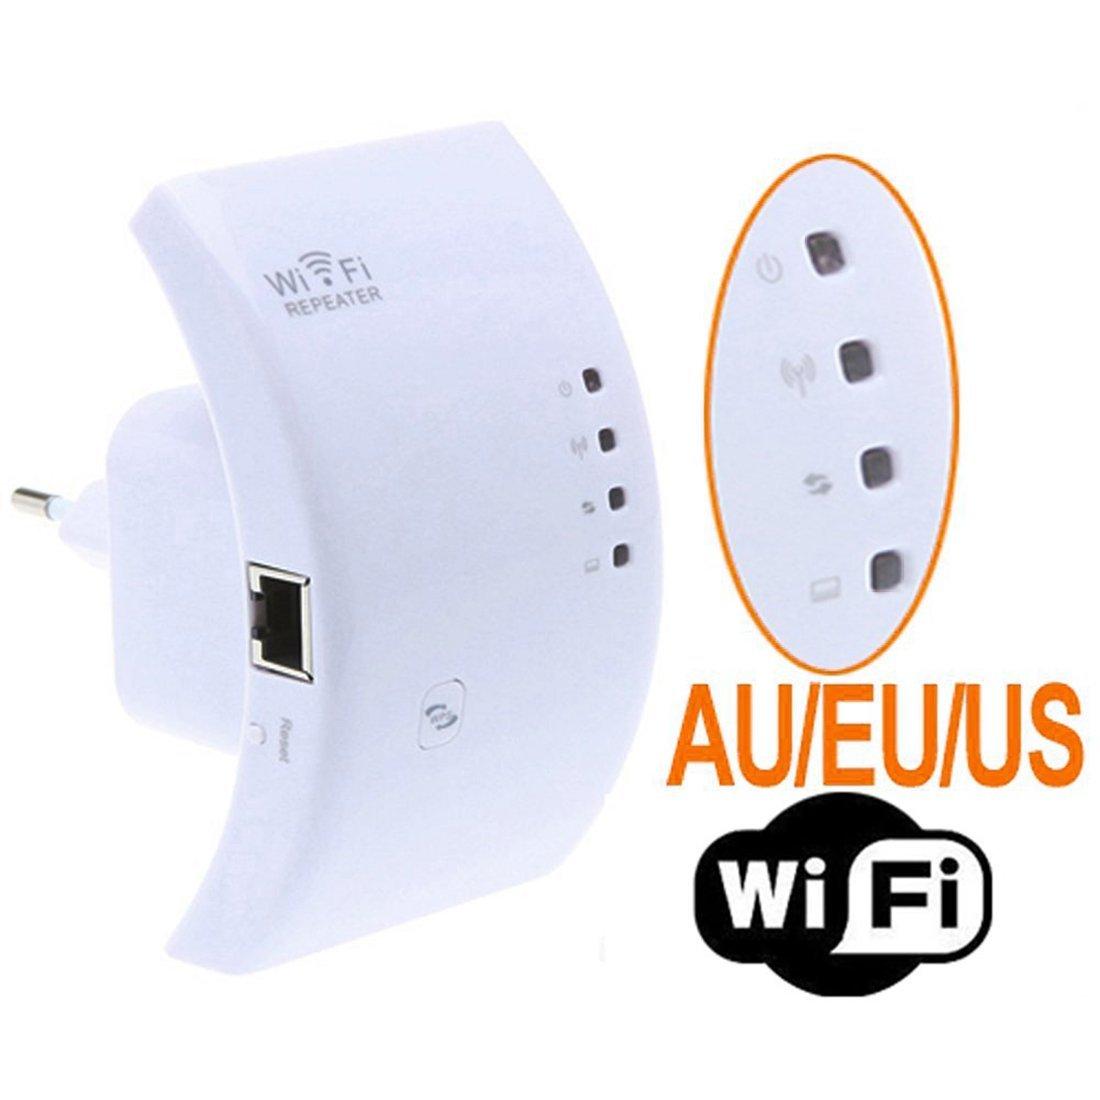 VAlinks(TM) Wireless-n Wifi Repeater 802.11n/b/g Network Router Range Extender 300m 2dbi Antennas Signal Boosters